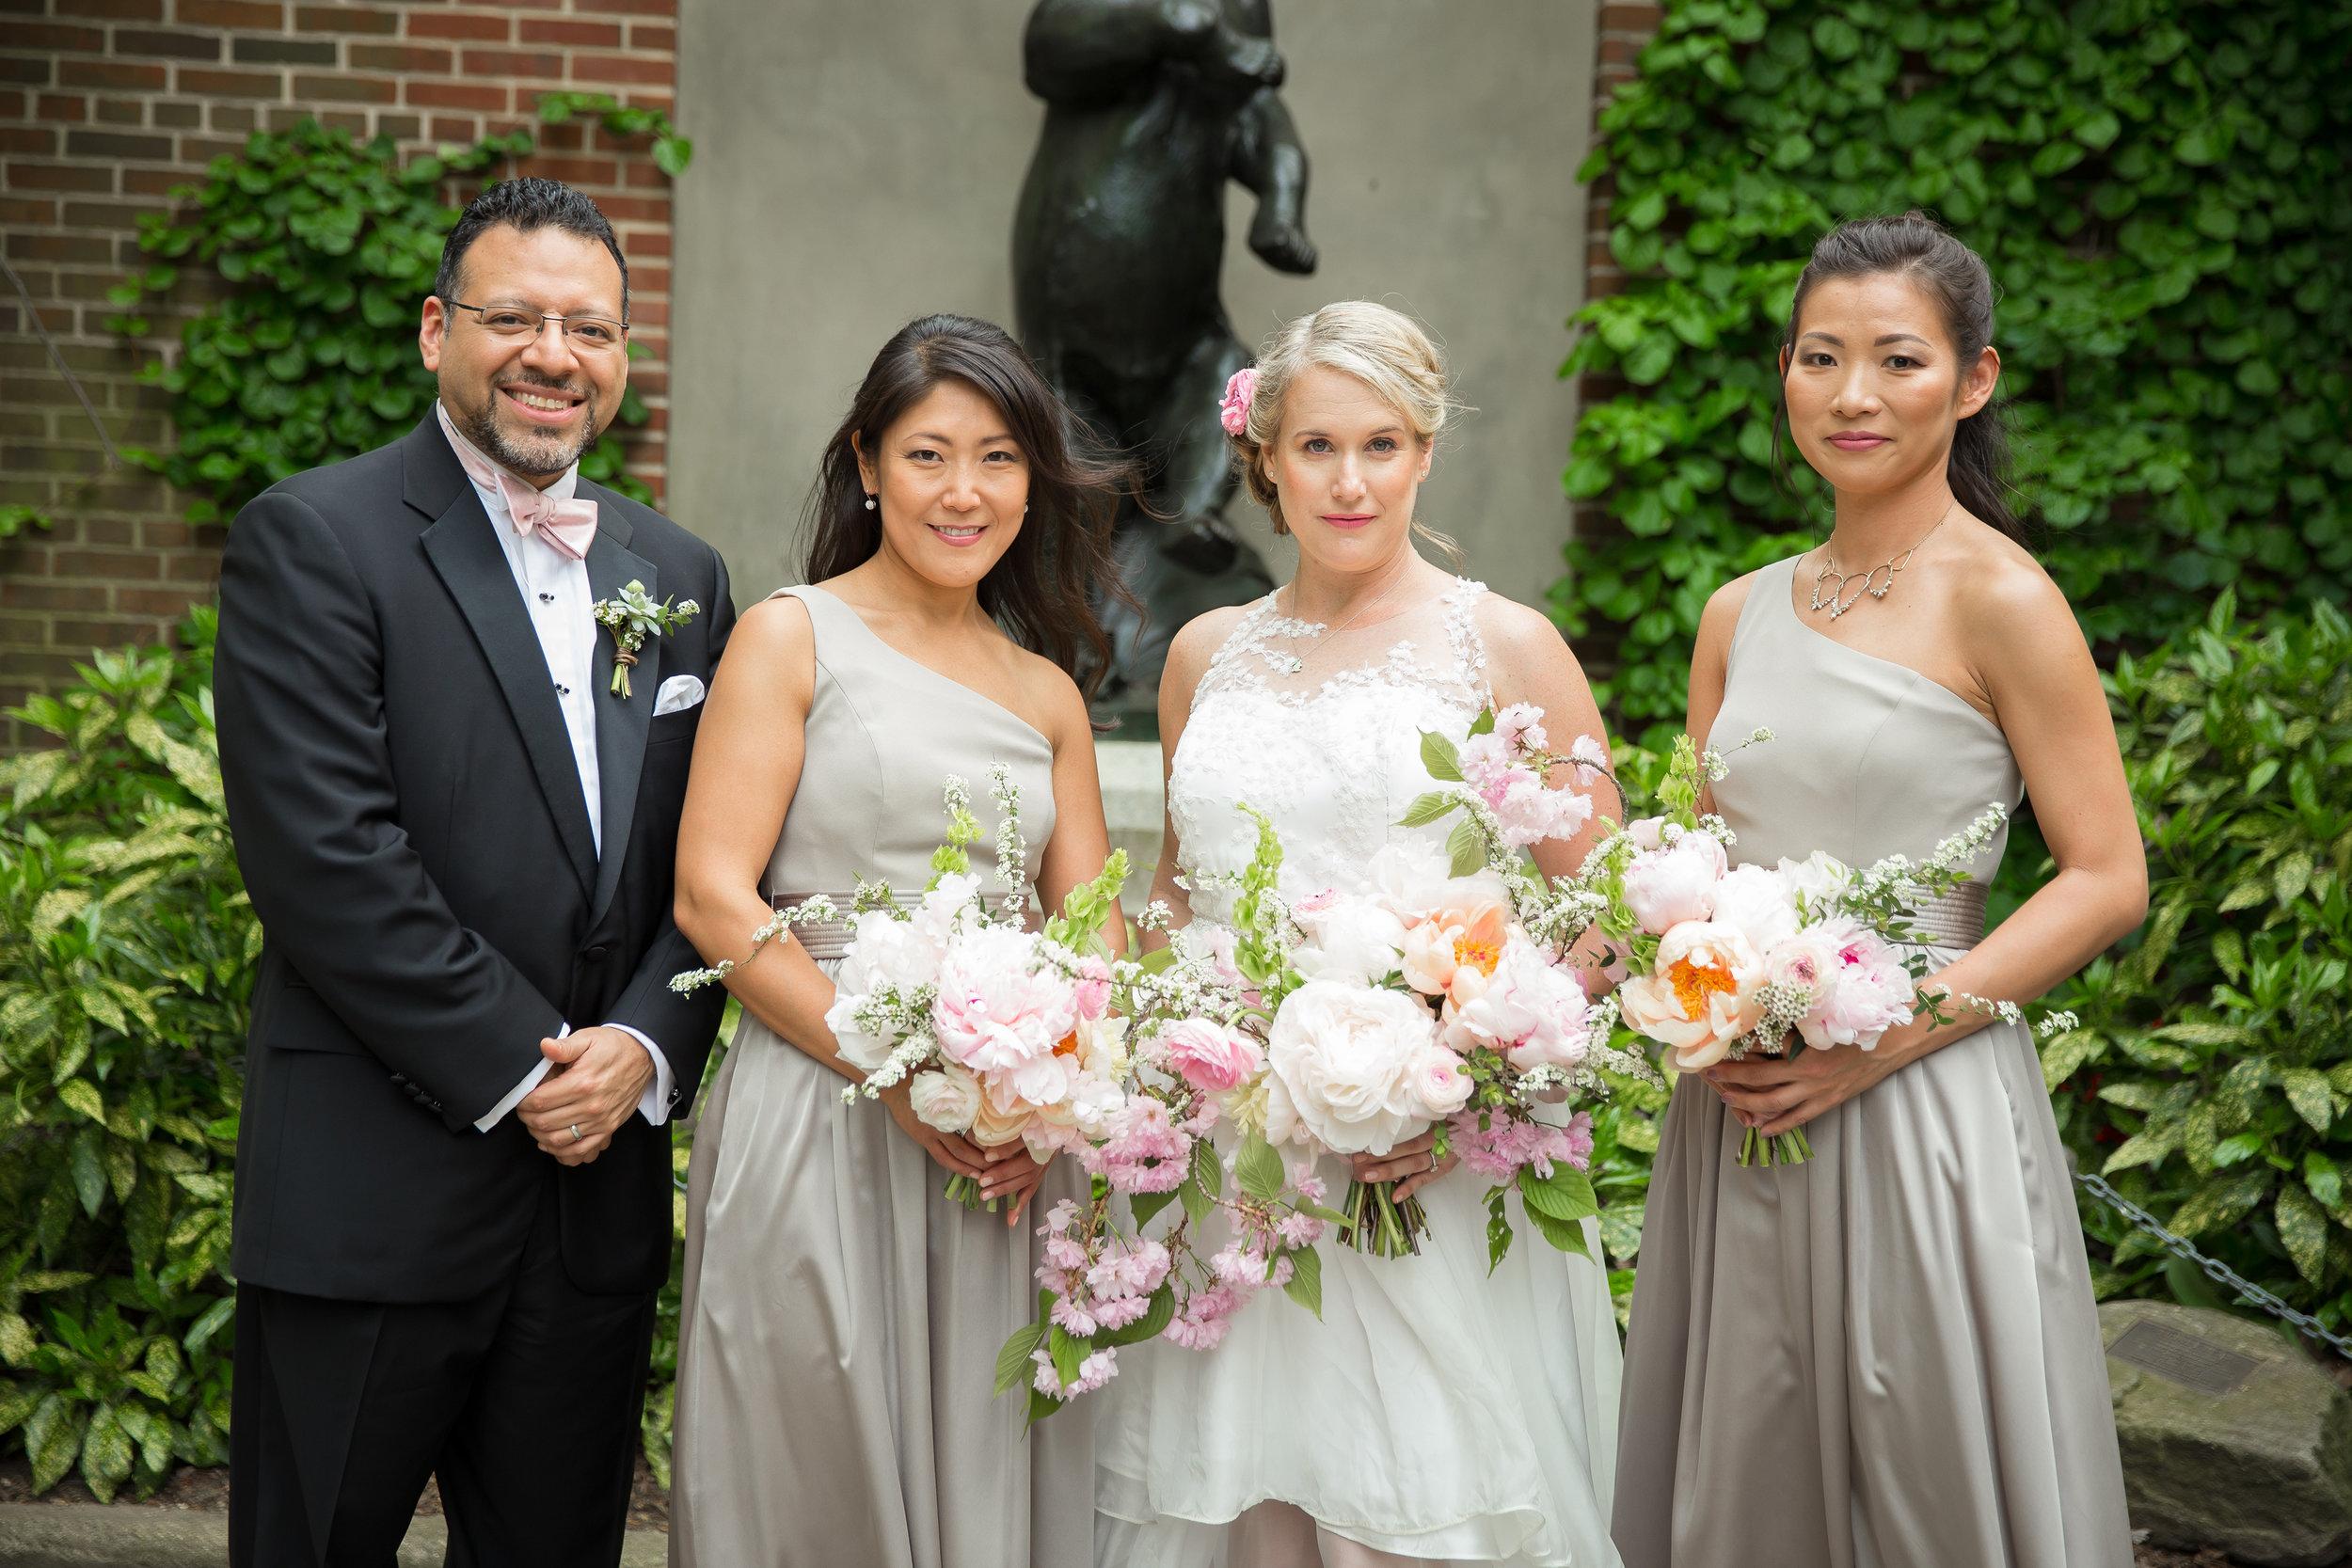 victorious-events-nyc-014-colleen-taka-central-park-zoo-wedding-raymond-hamlin.jpg